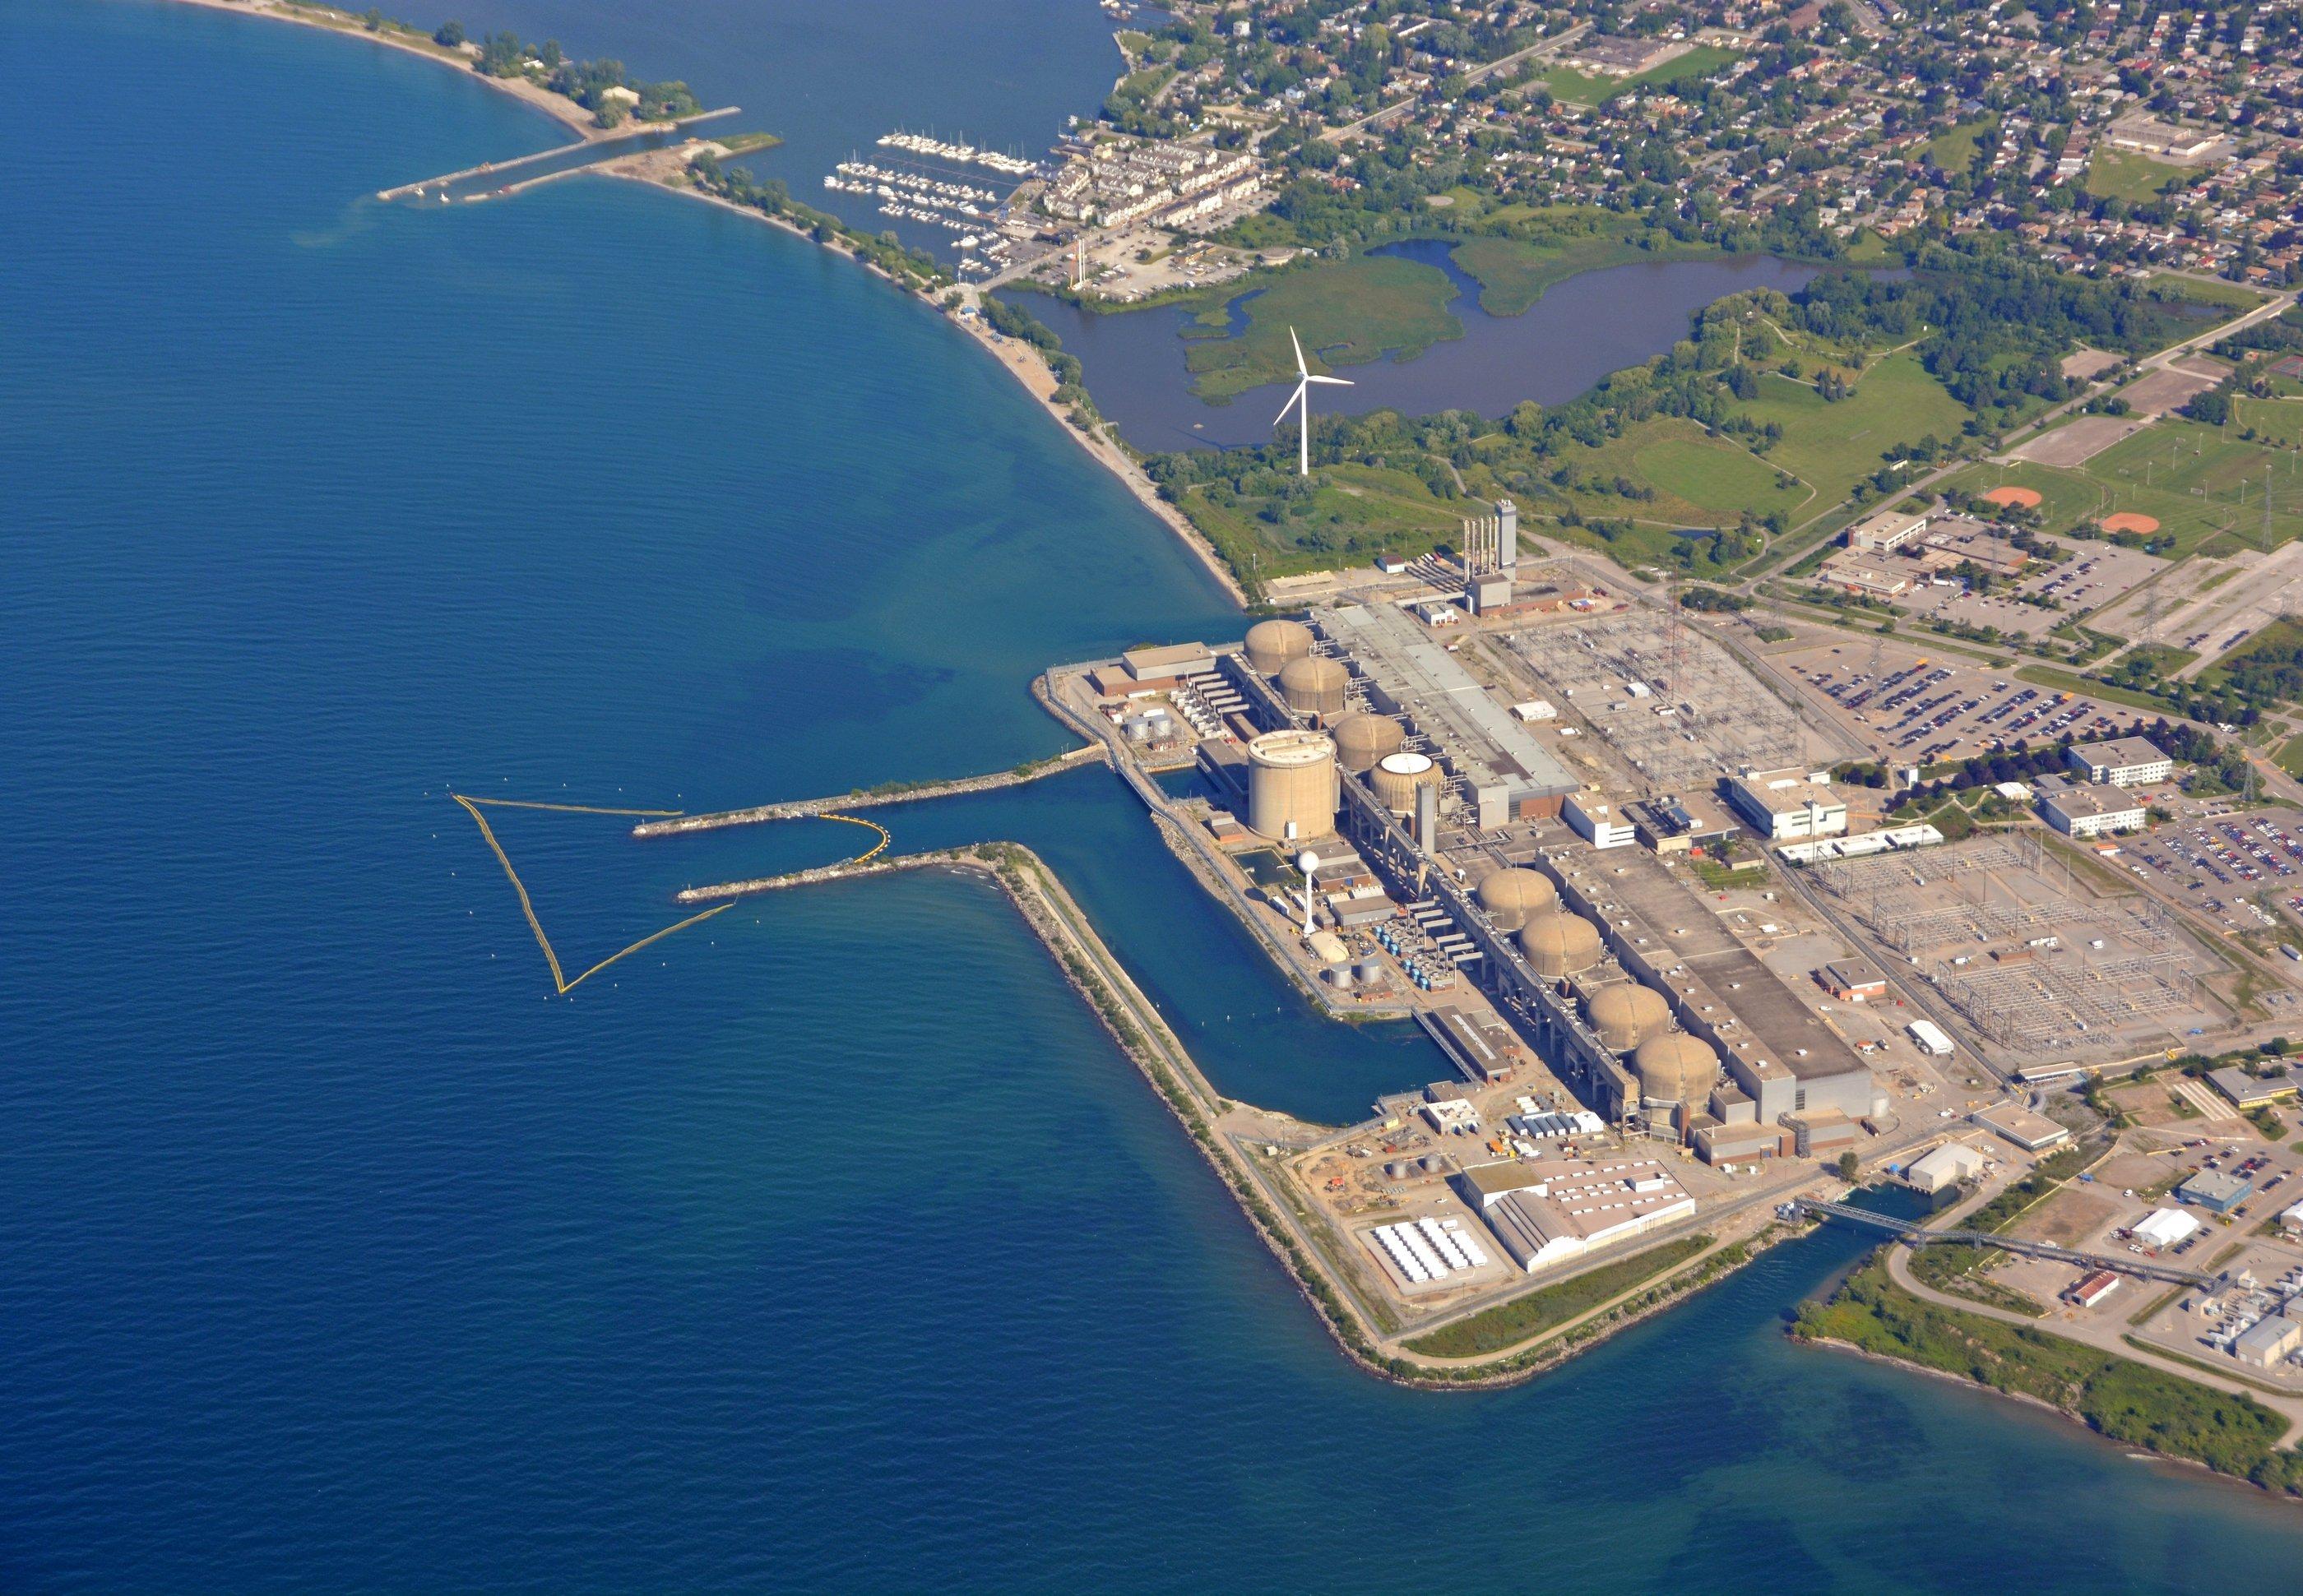 Nuclear power generators inspected